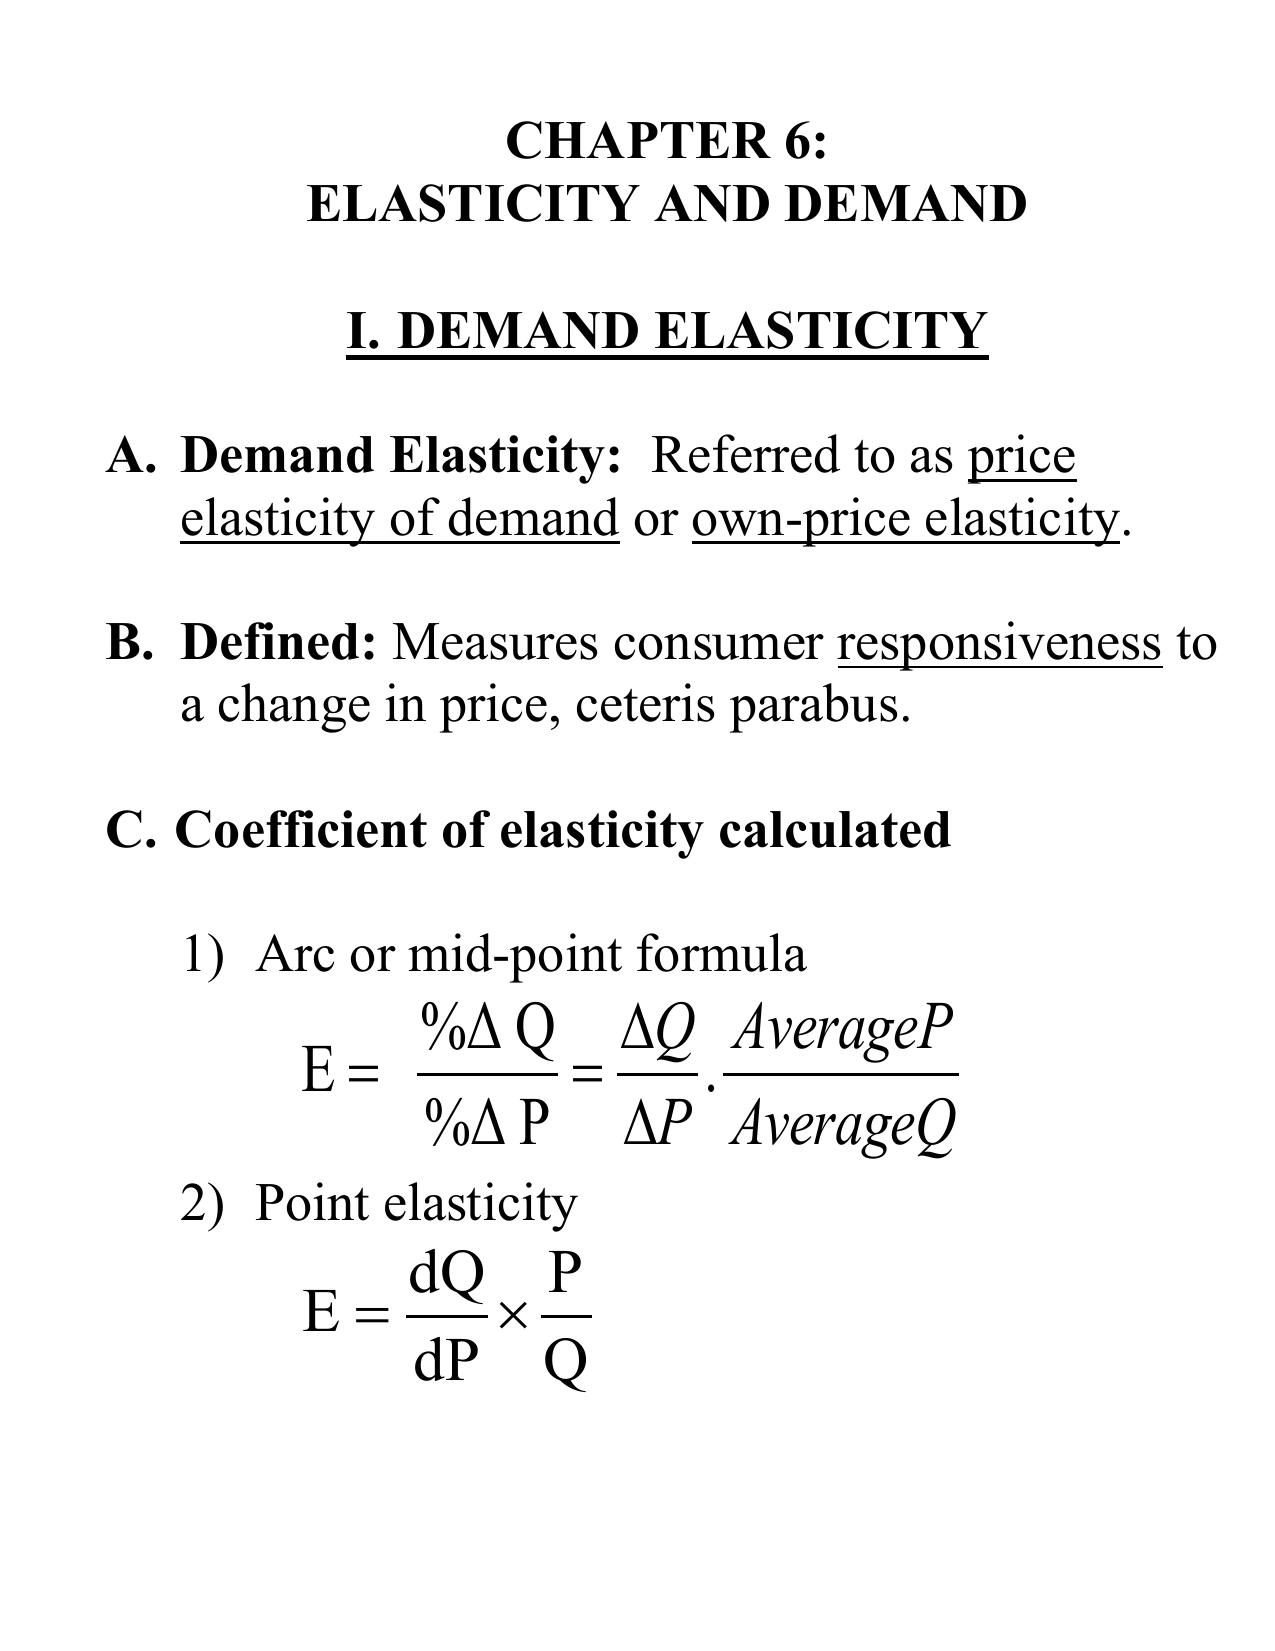 arc price elasticity of demand formula